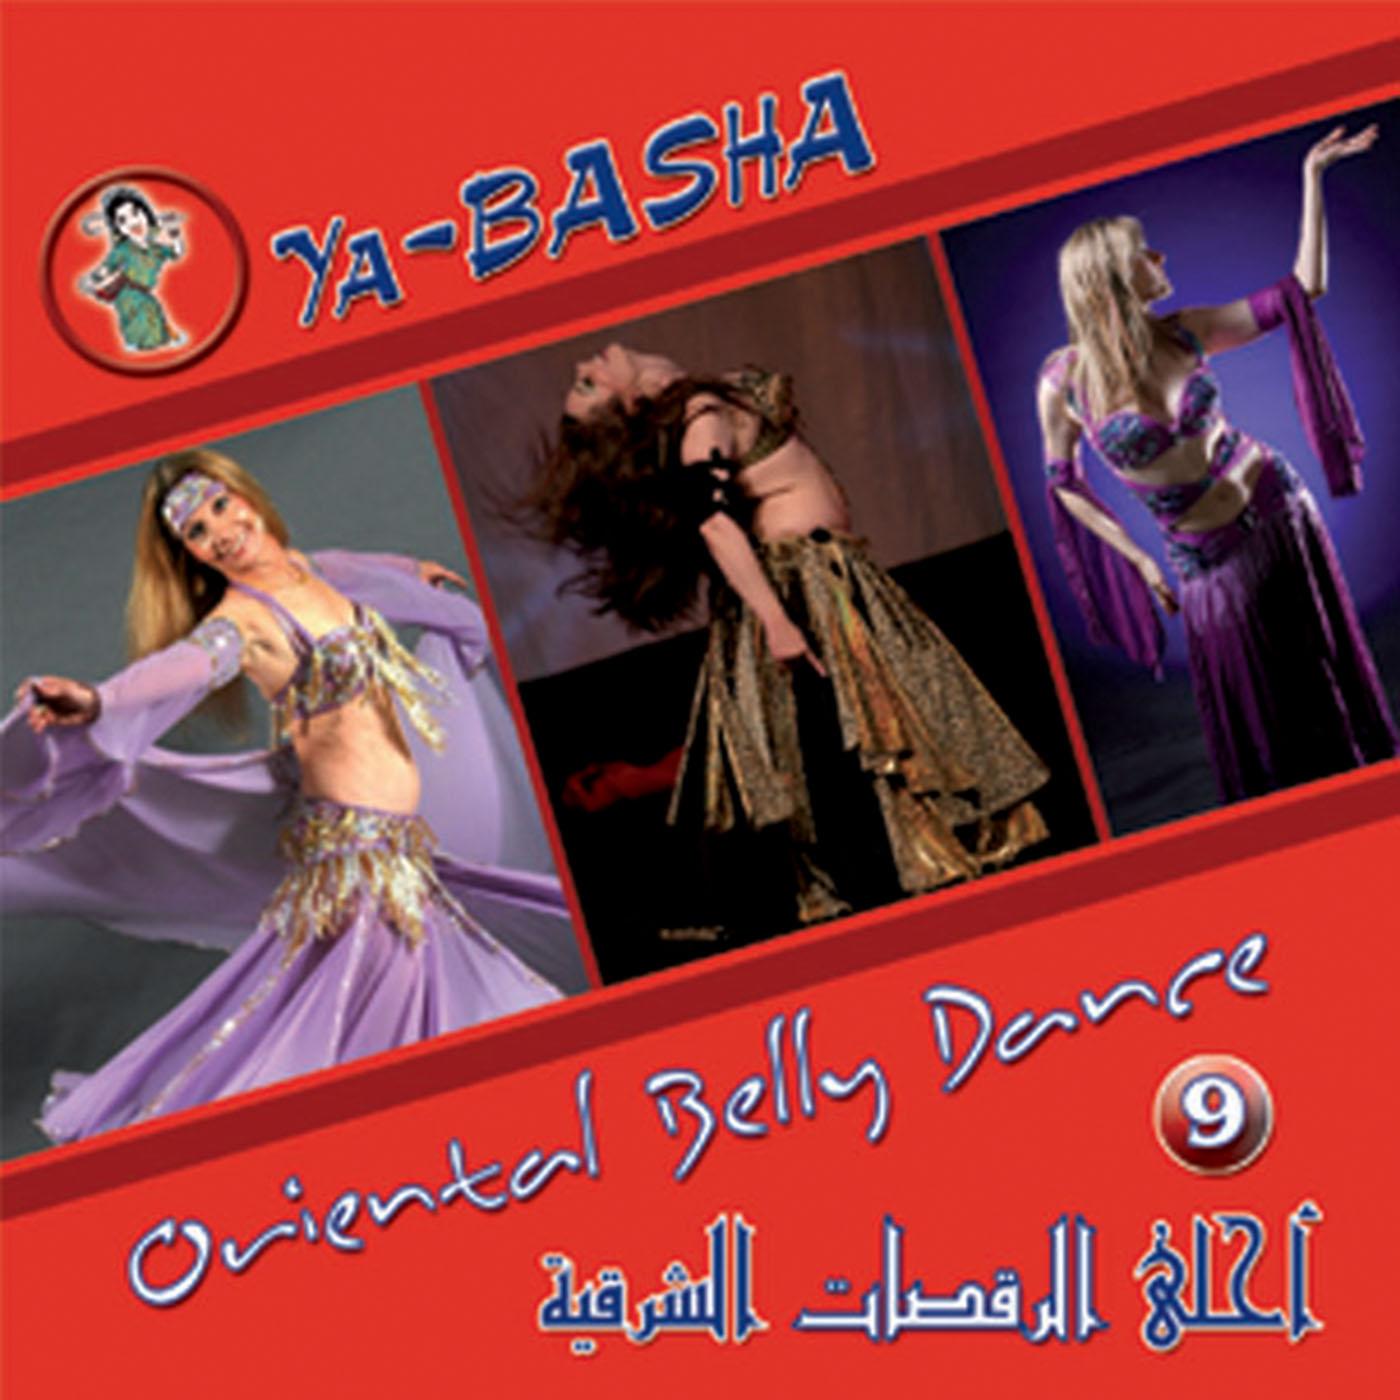 Ya-BASHA (Oriental Belly Dance Vol 9 )/  VARIOUS ARTISTS     BUY IT